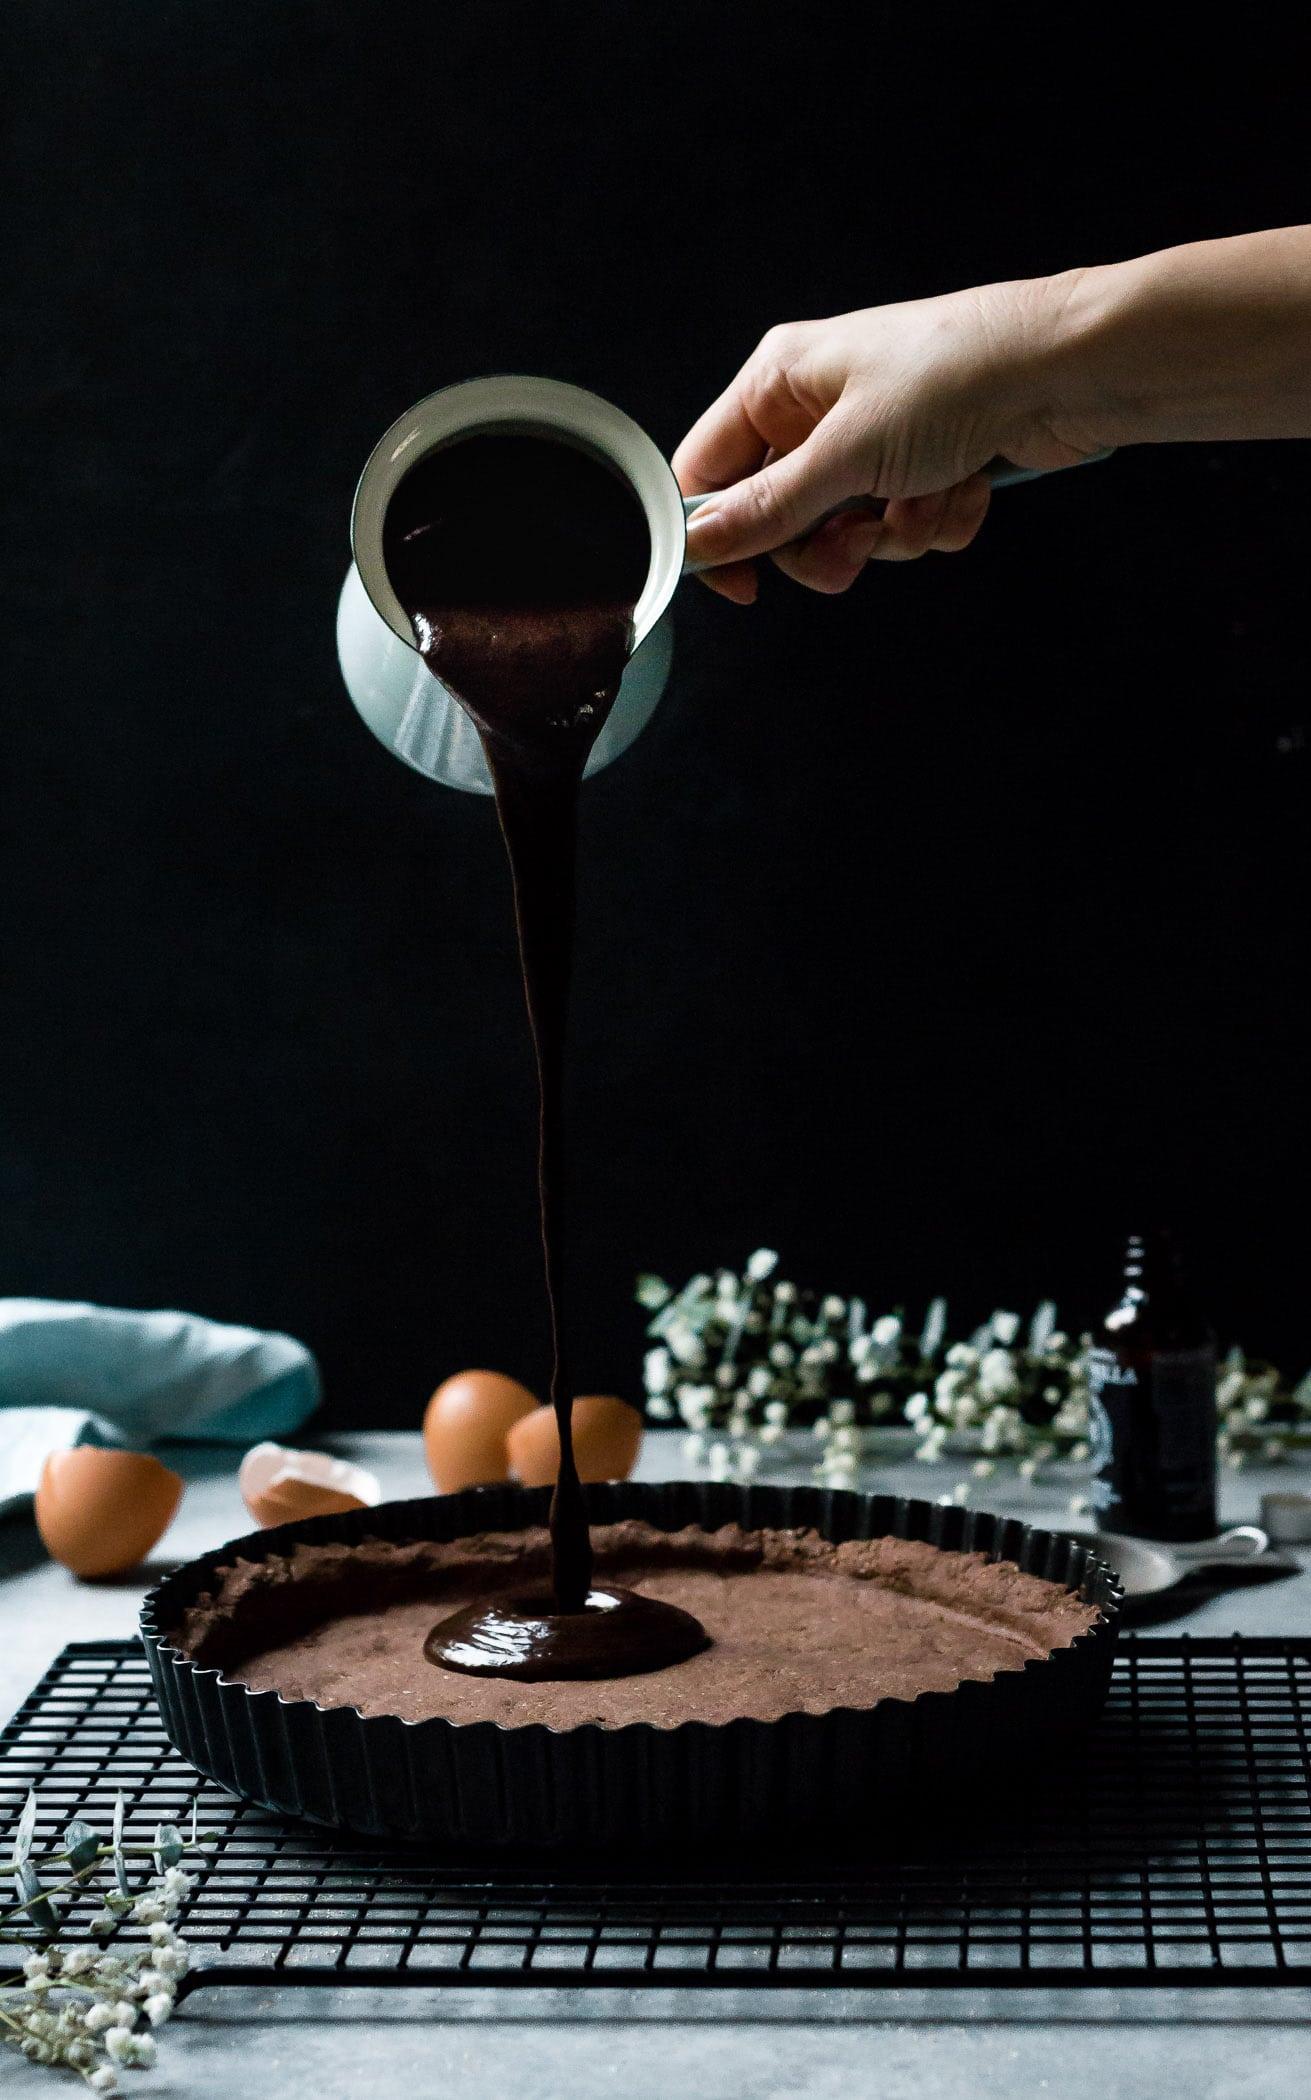 chocolate custard being poured into dark chocolate tart